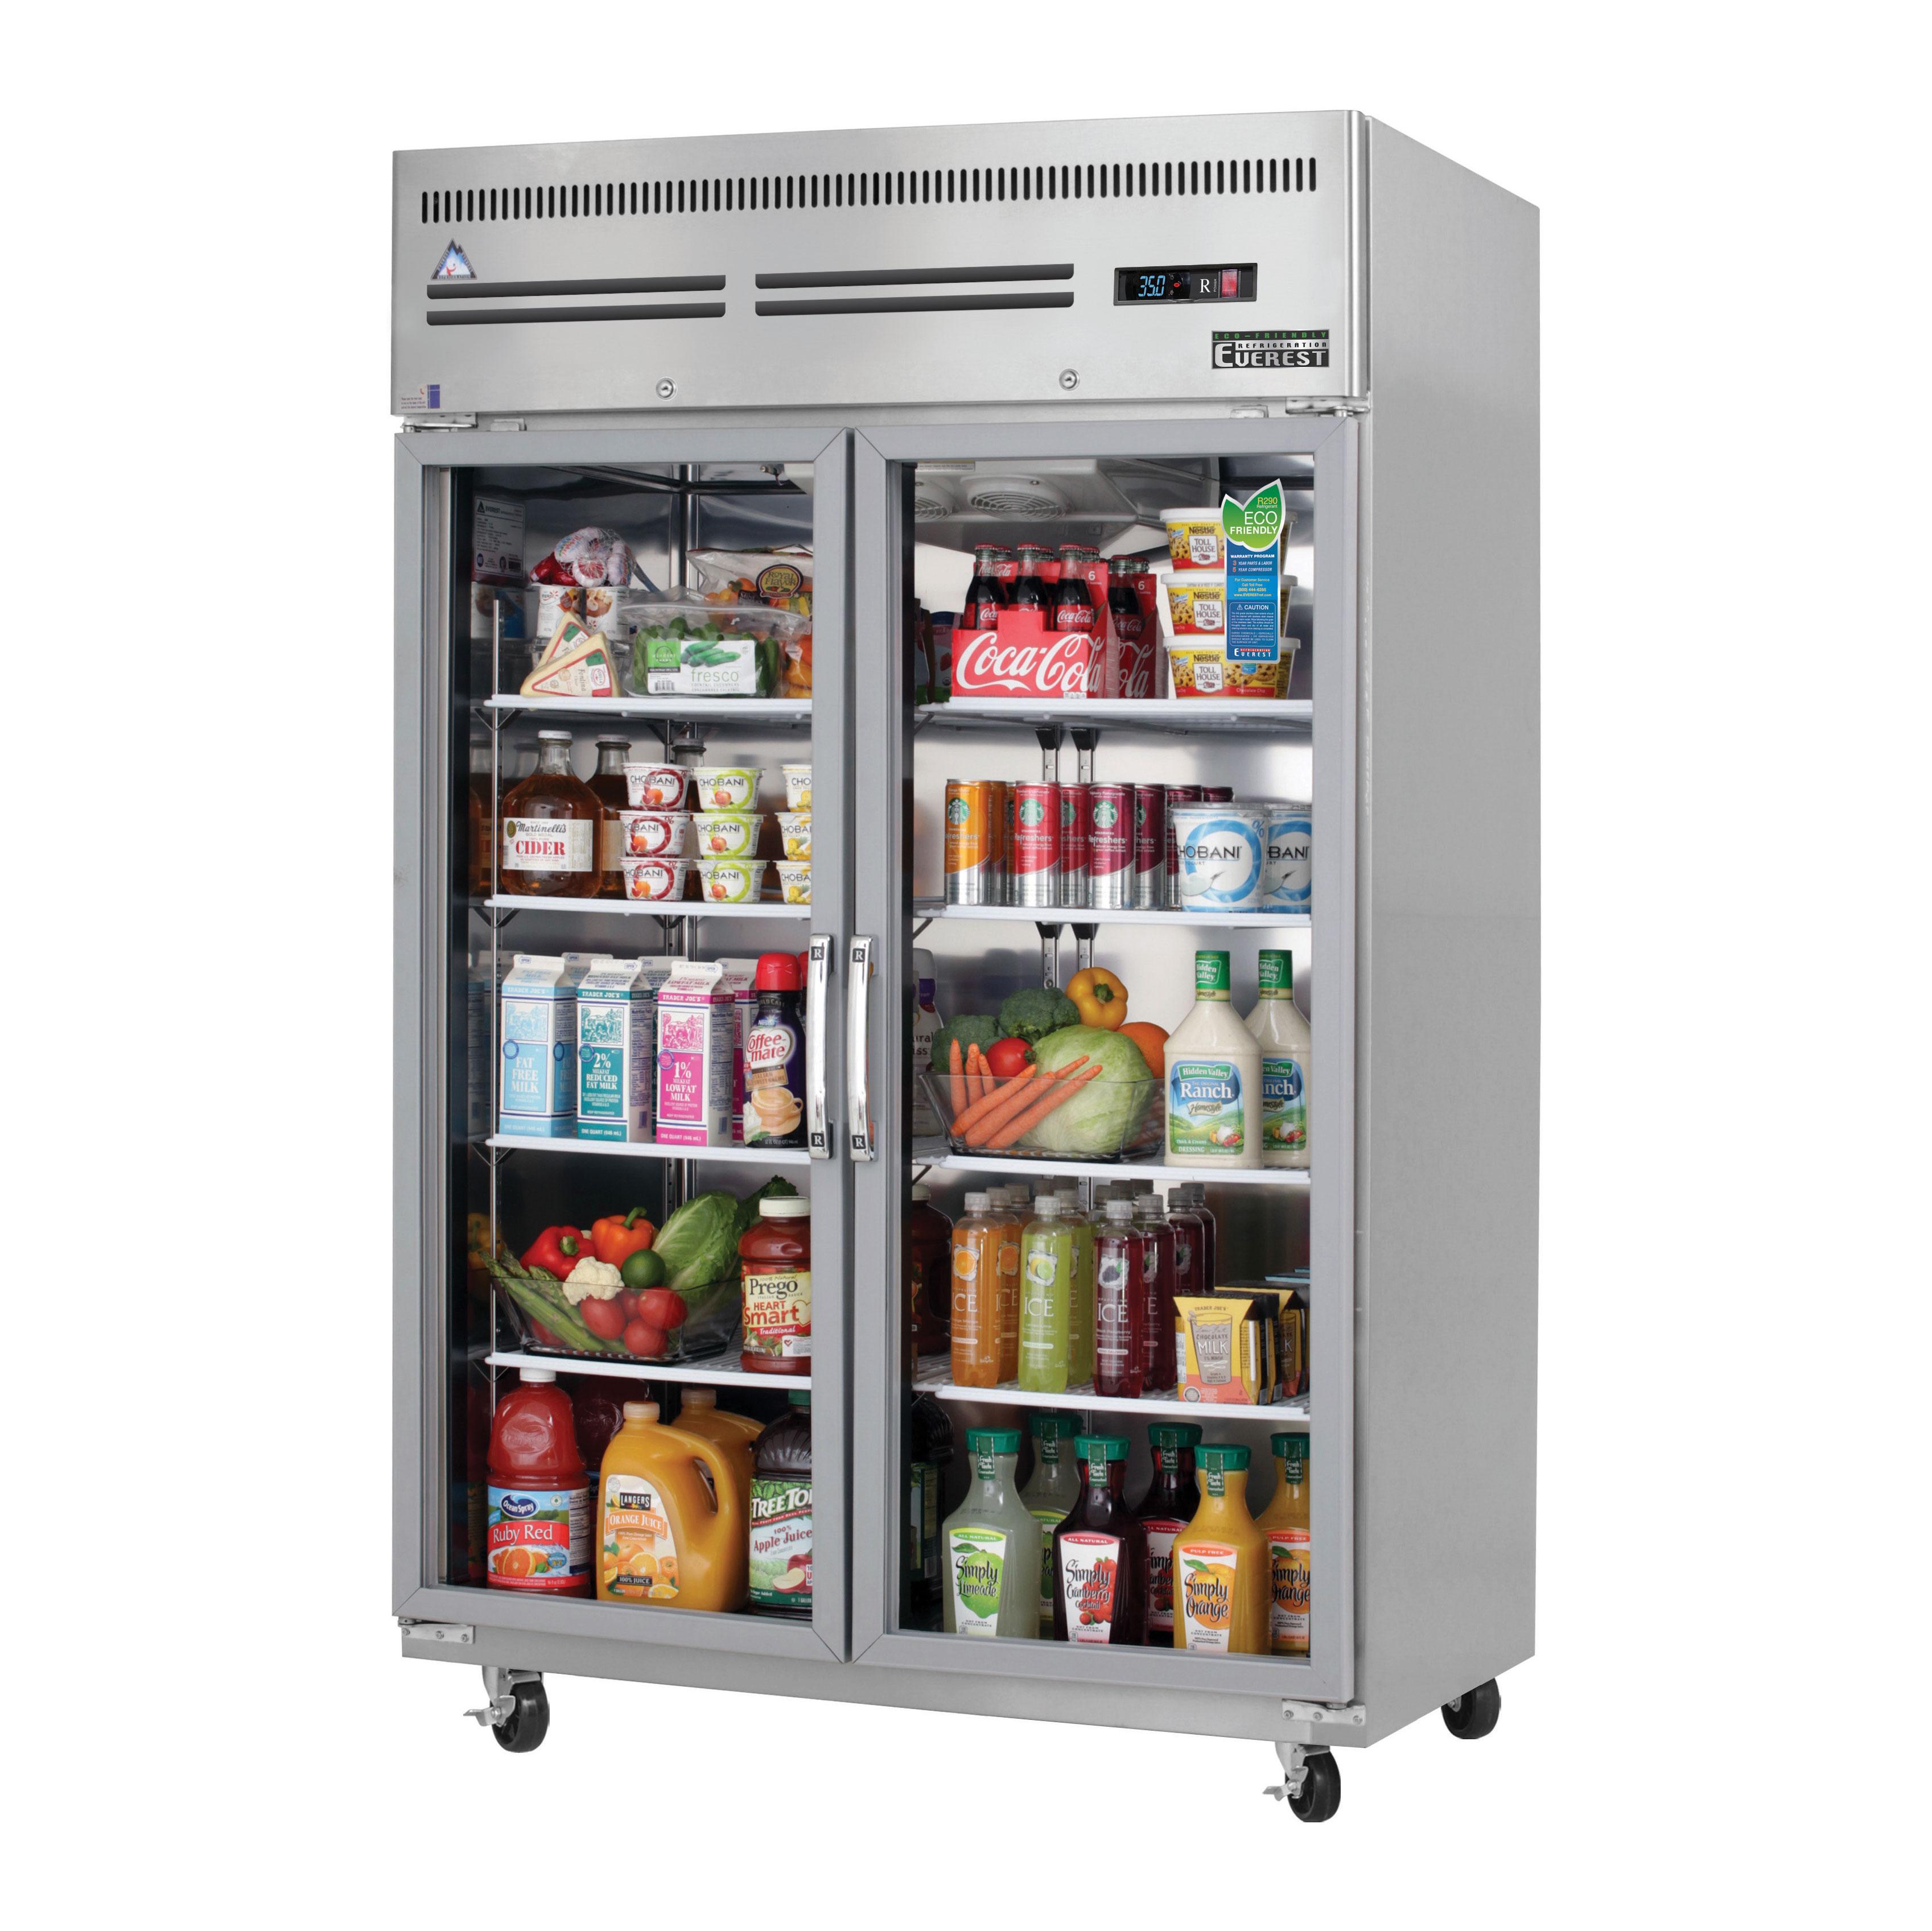 Everest Refrigeration ESGR2 refrigerator, reach-in